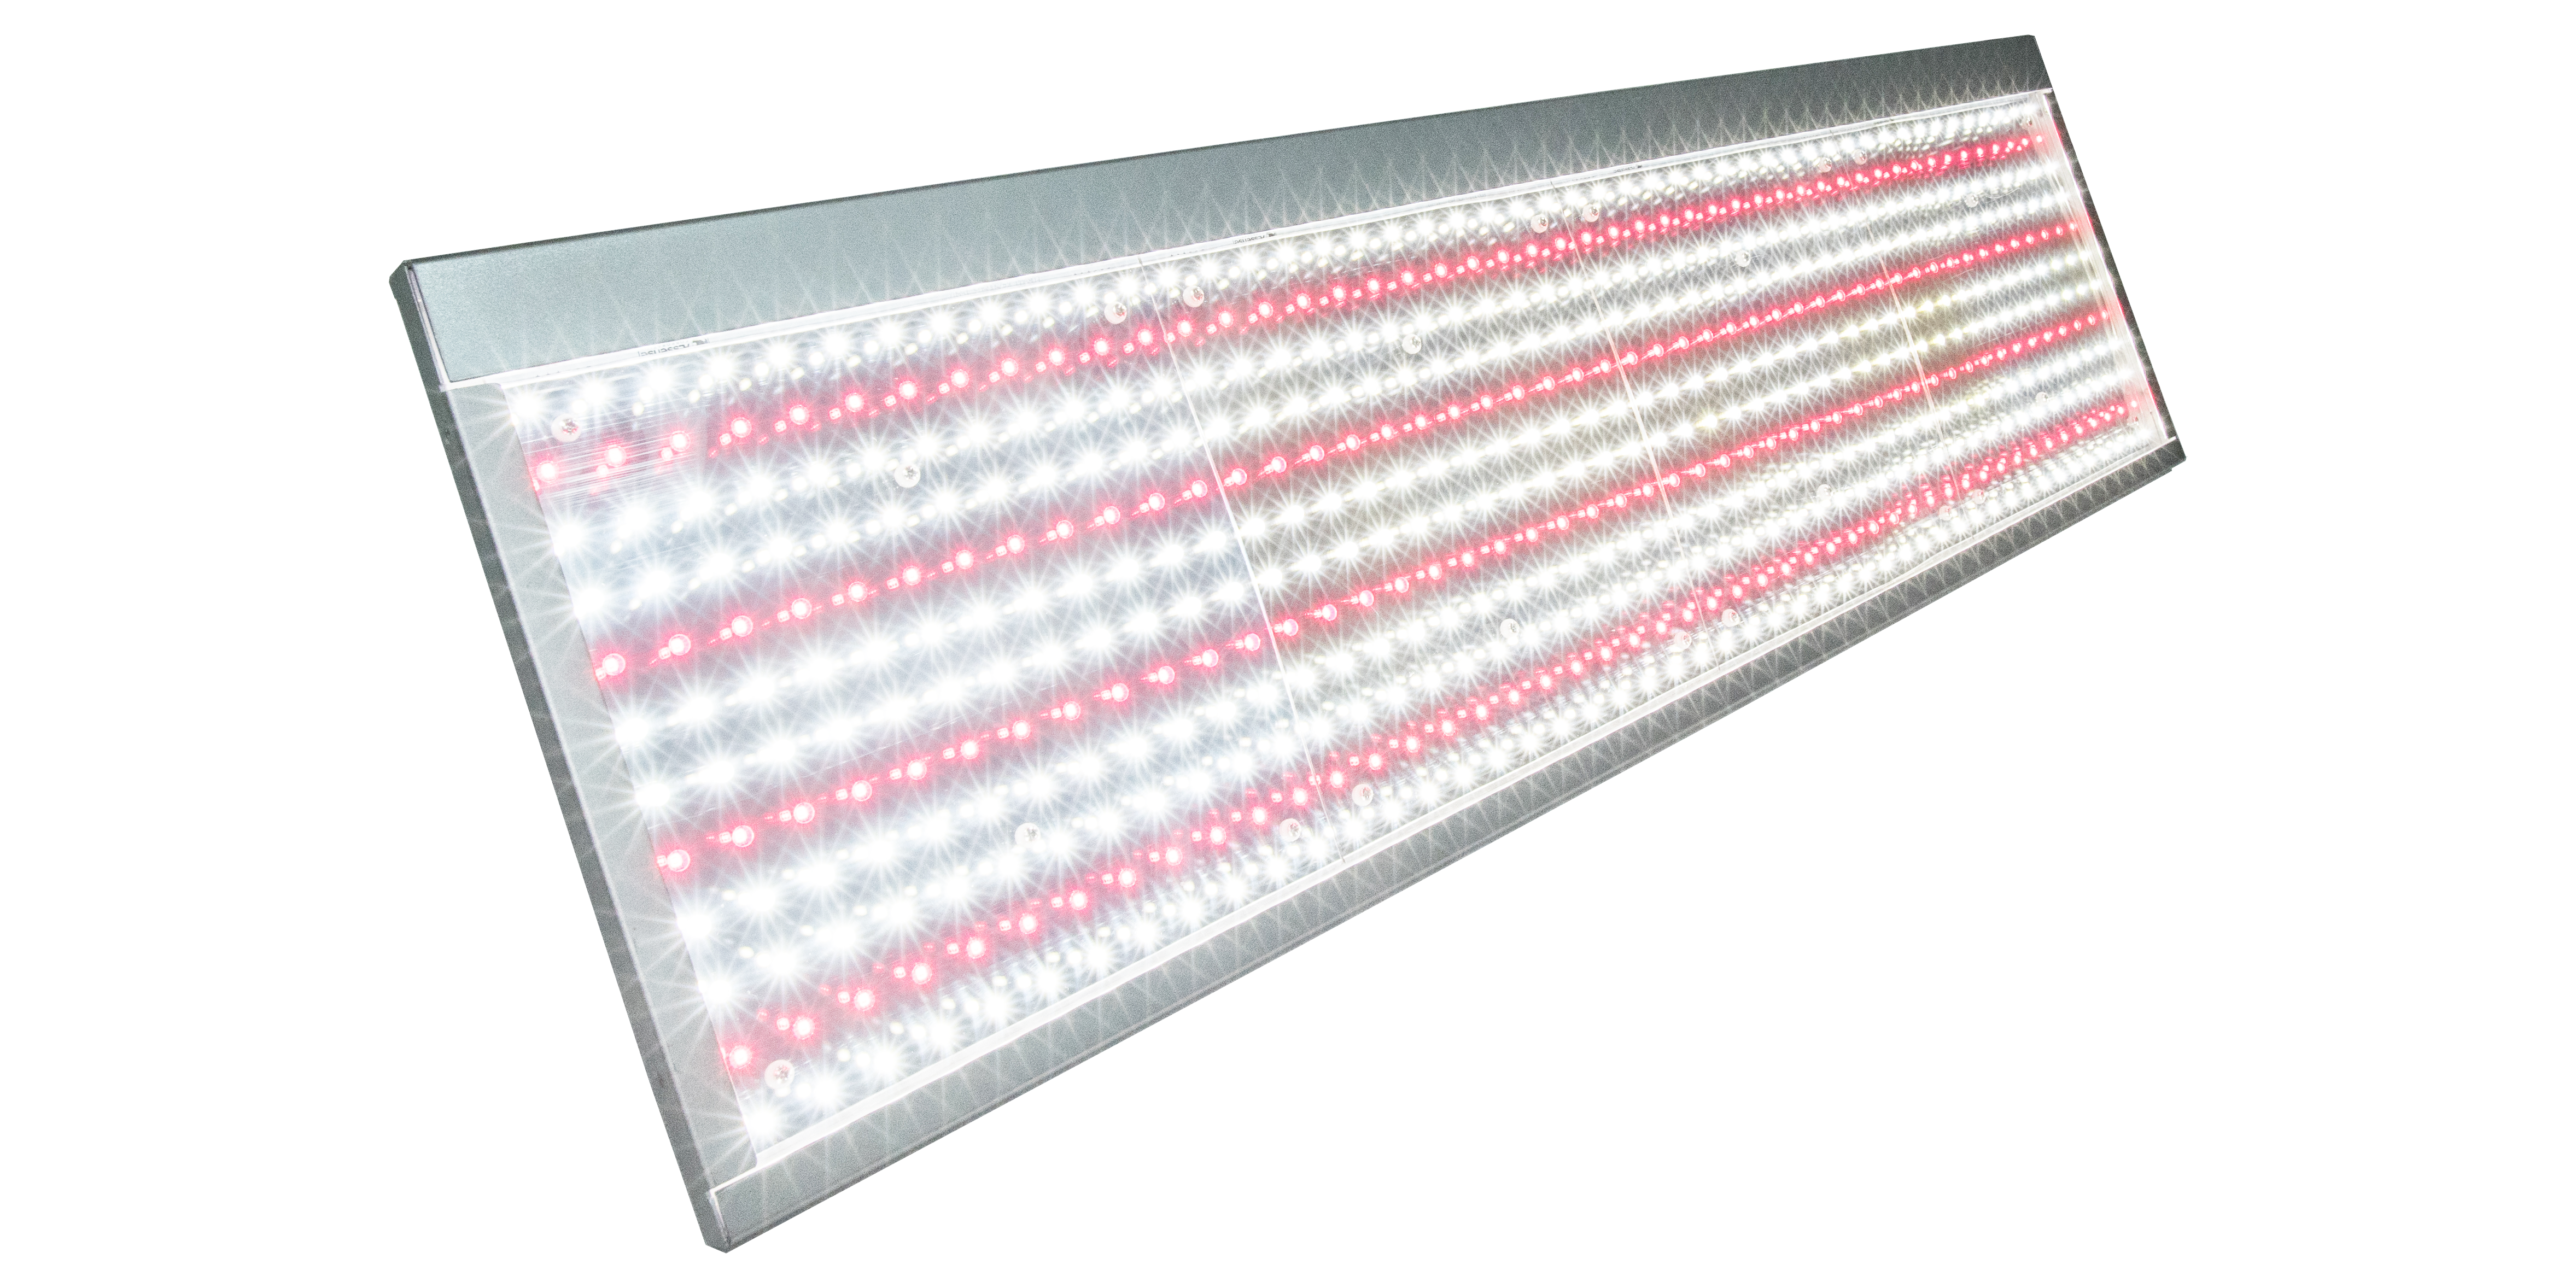 AEdge LED grow light panel